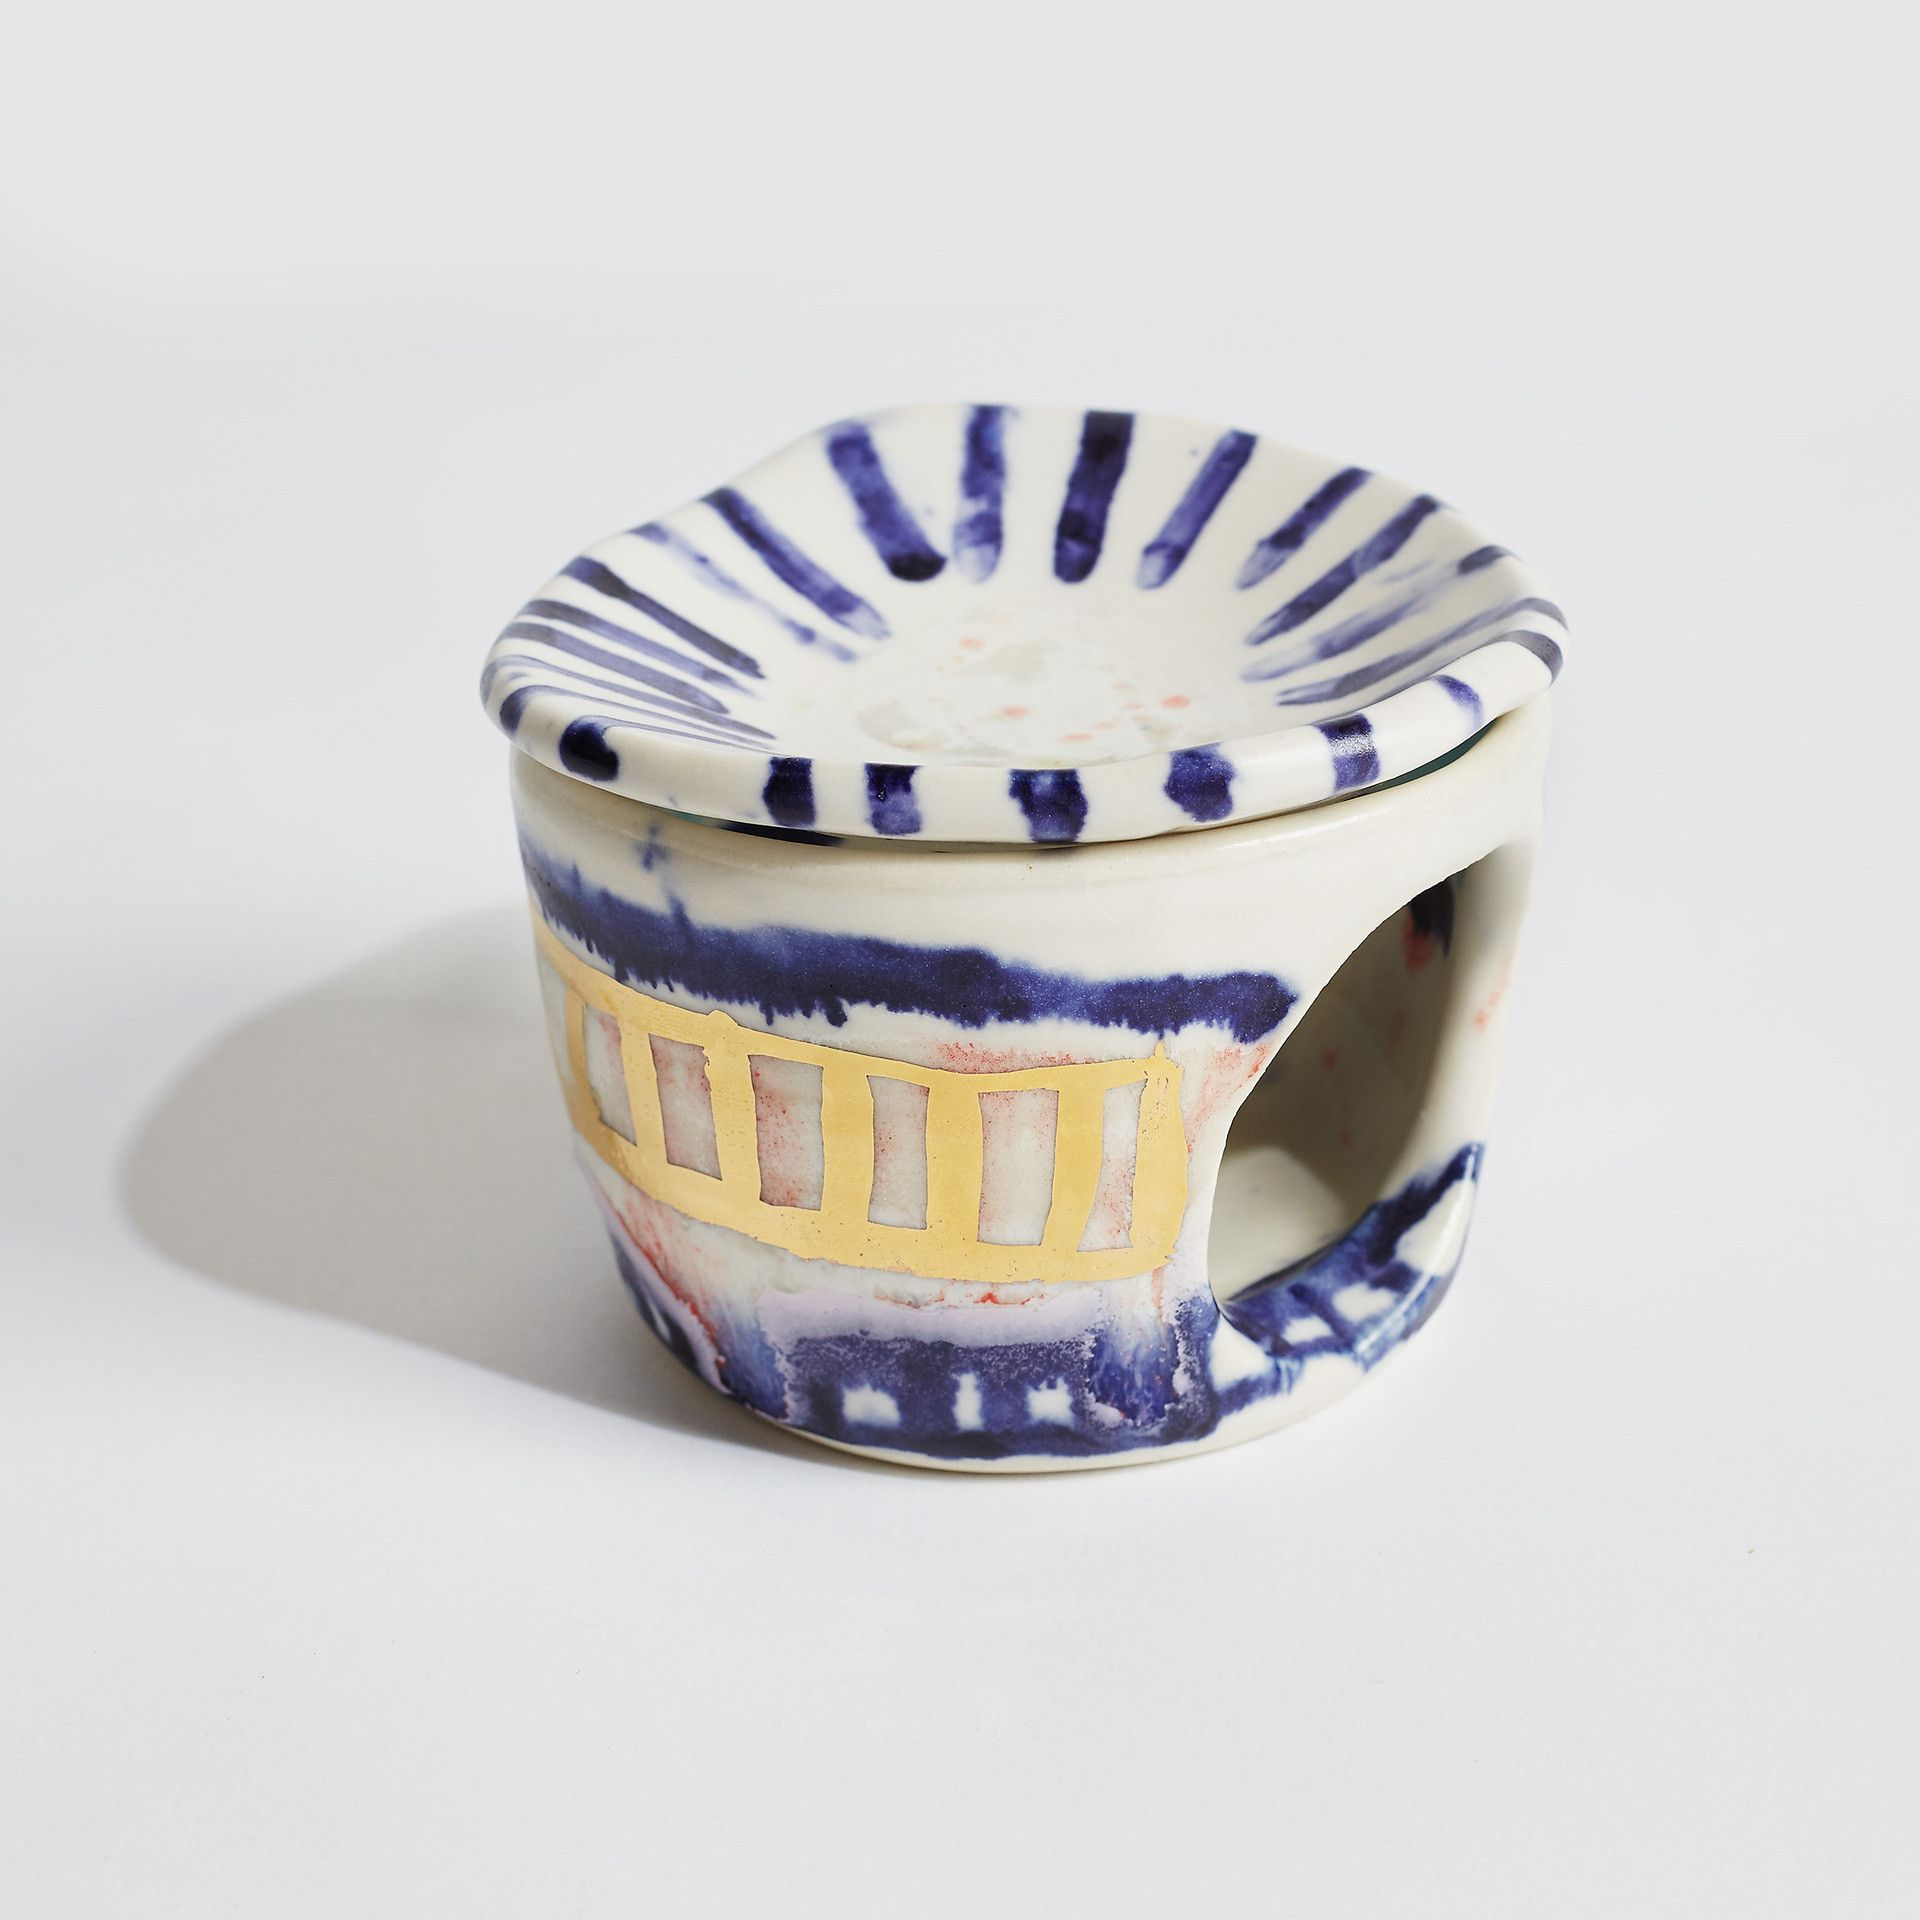 Jessilla rogers oil burner oil burners pottery